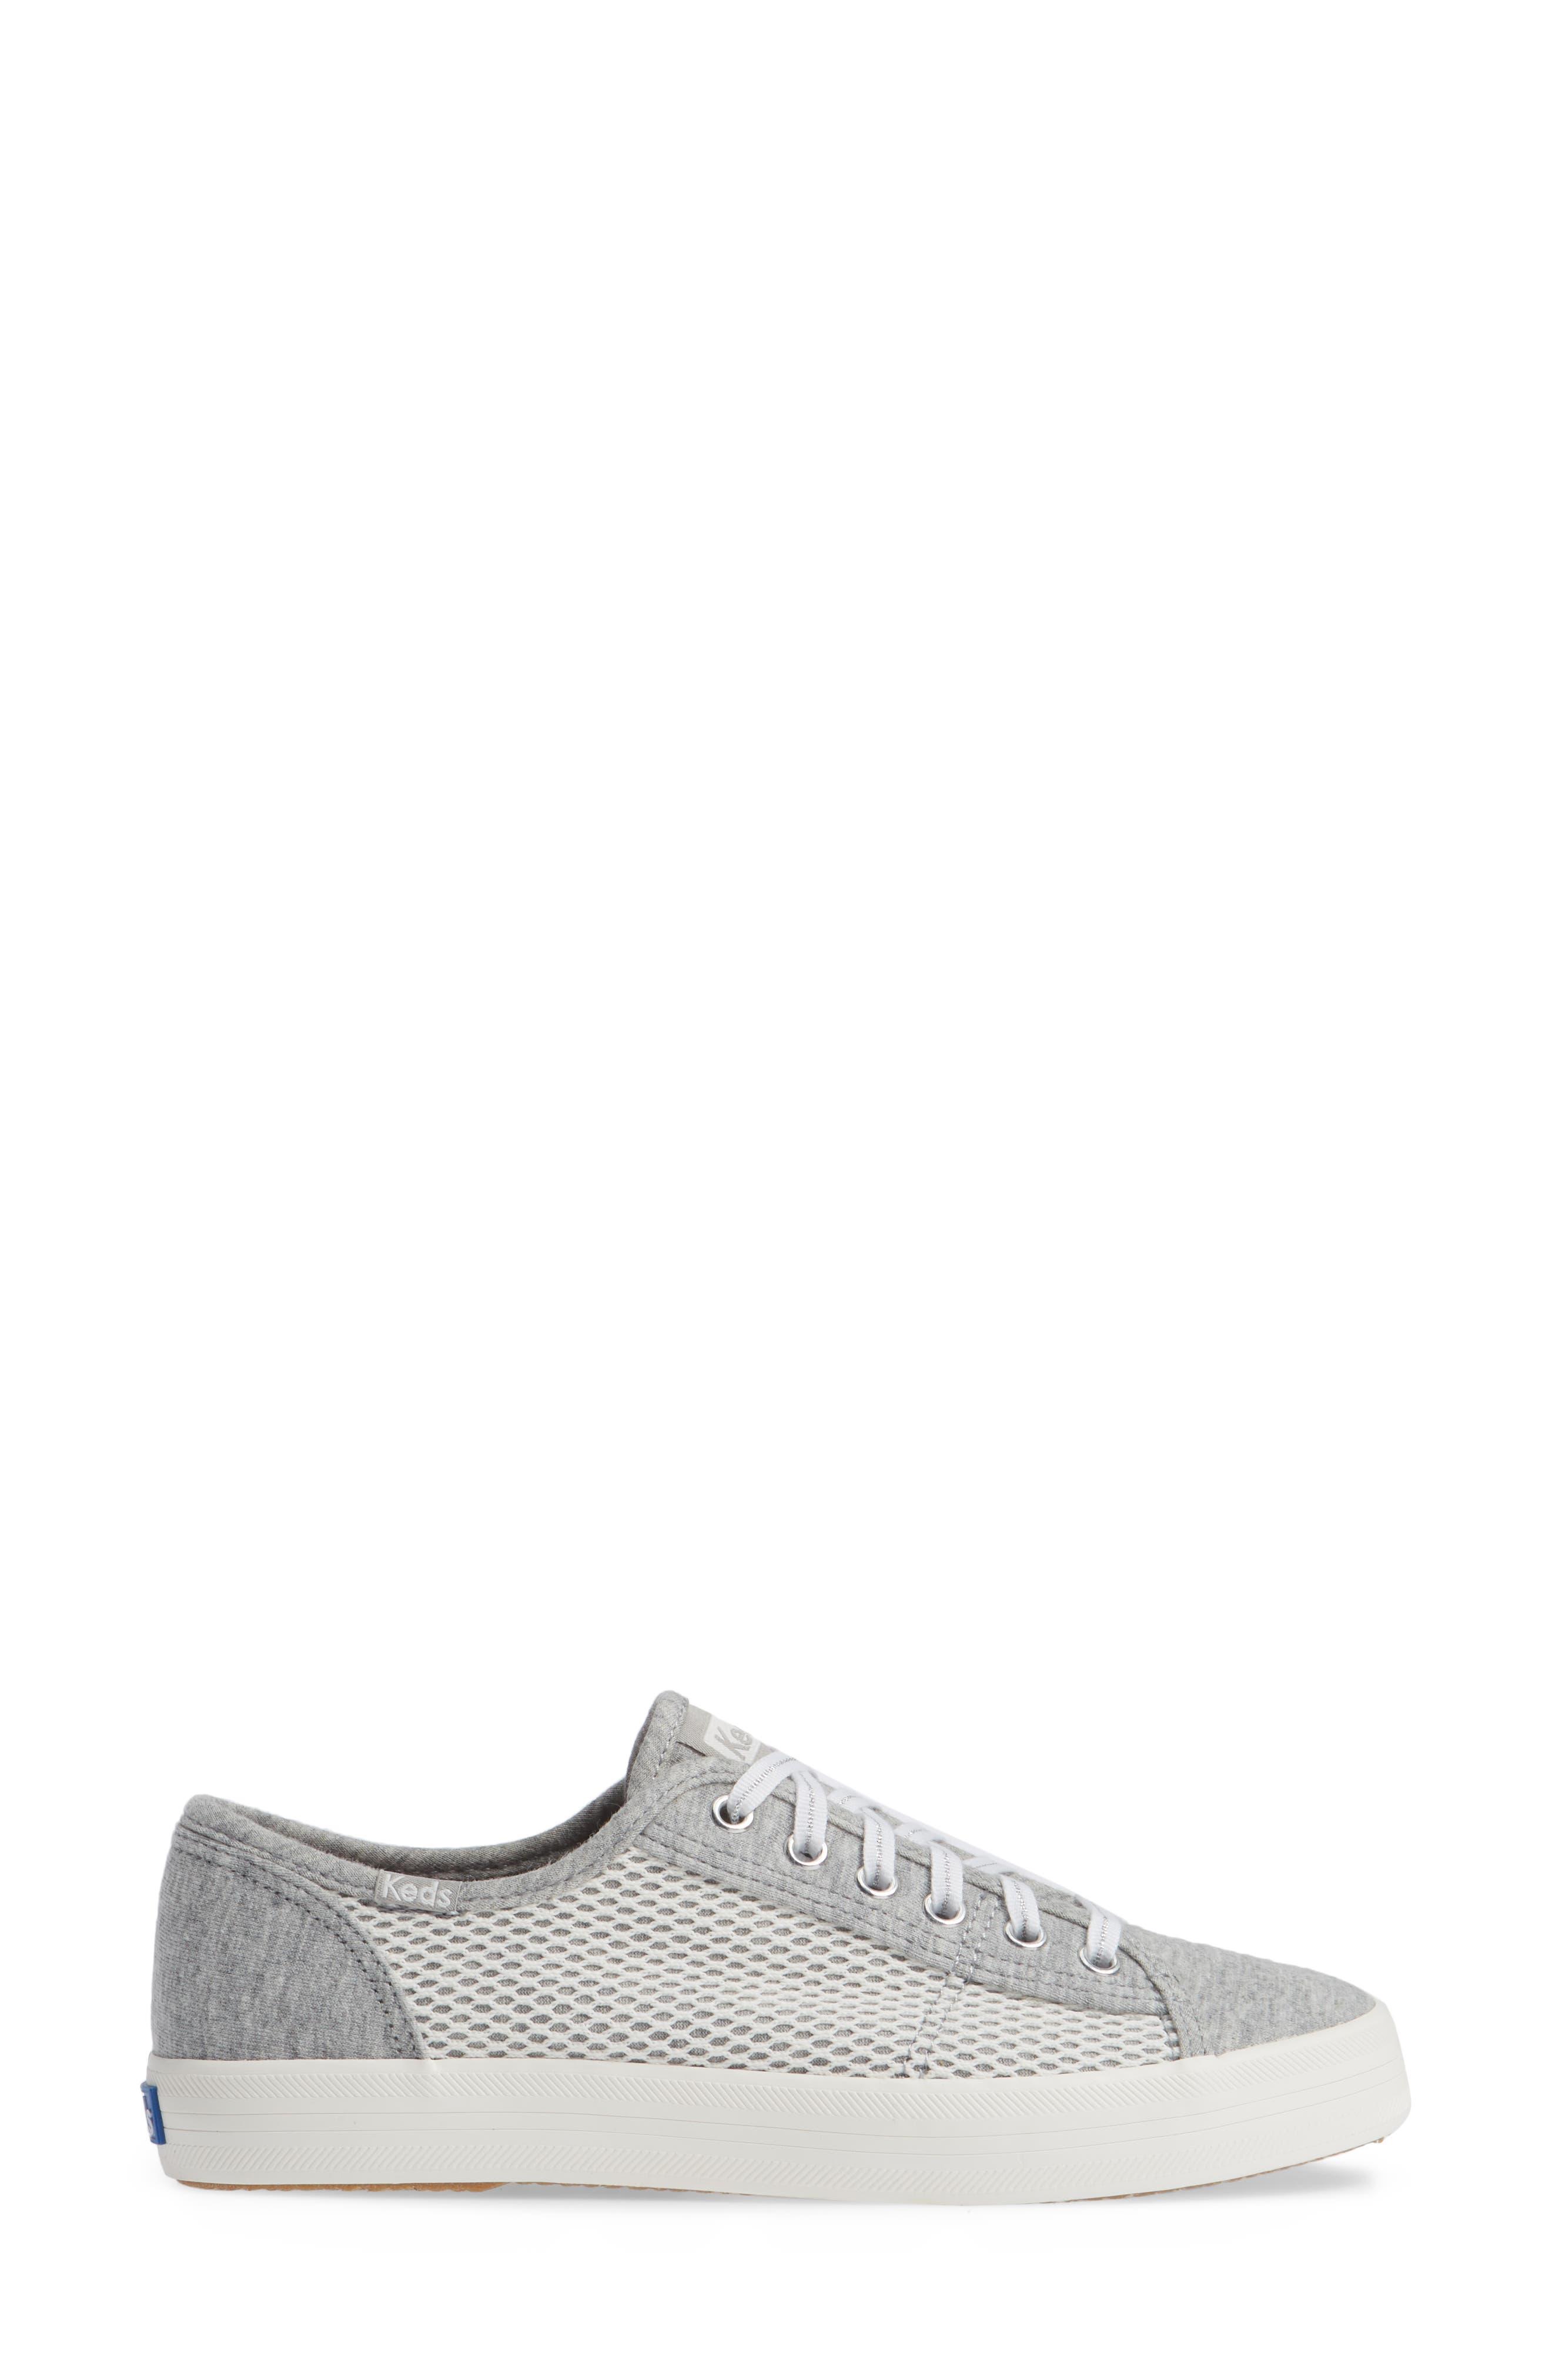 KEDS<SUP>®</SUP>, Kickstart Mesh & Jersey Sneaker, Alternate thumbnail 3, color, LIGHT GRAY